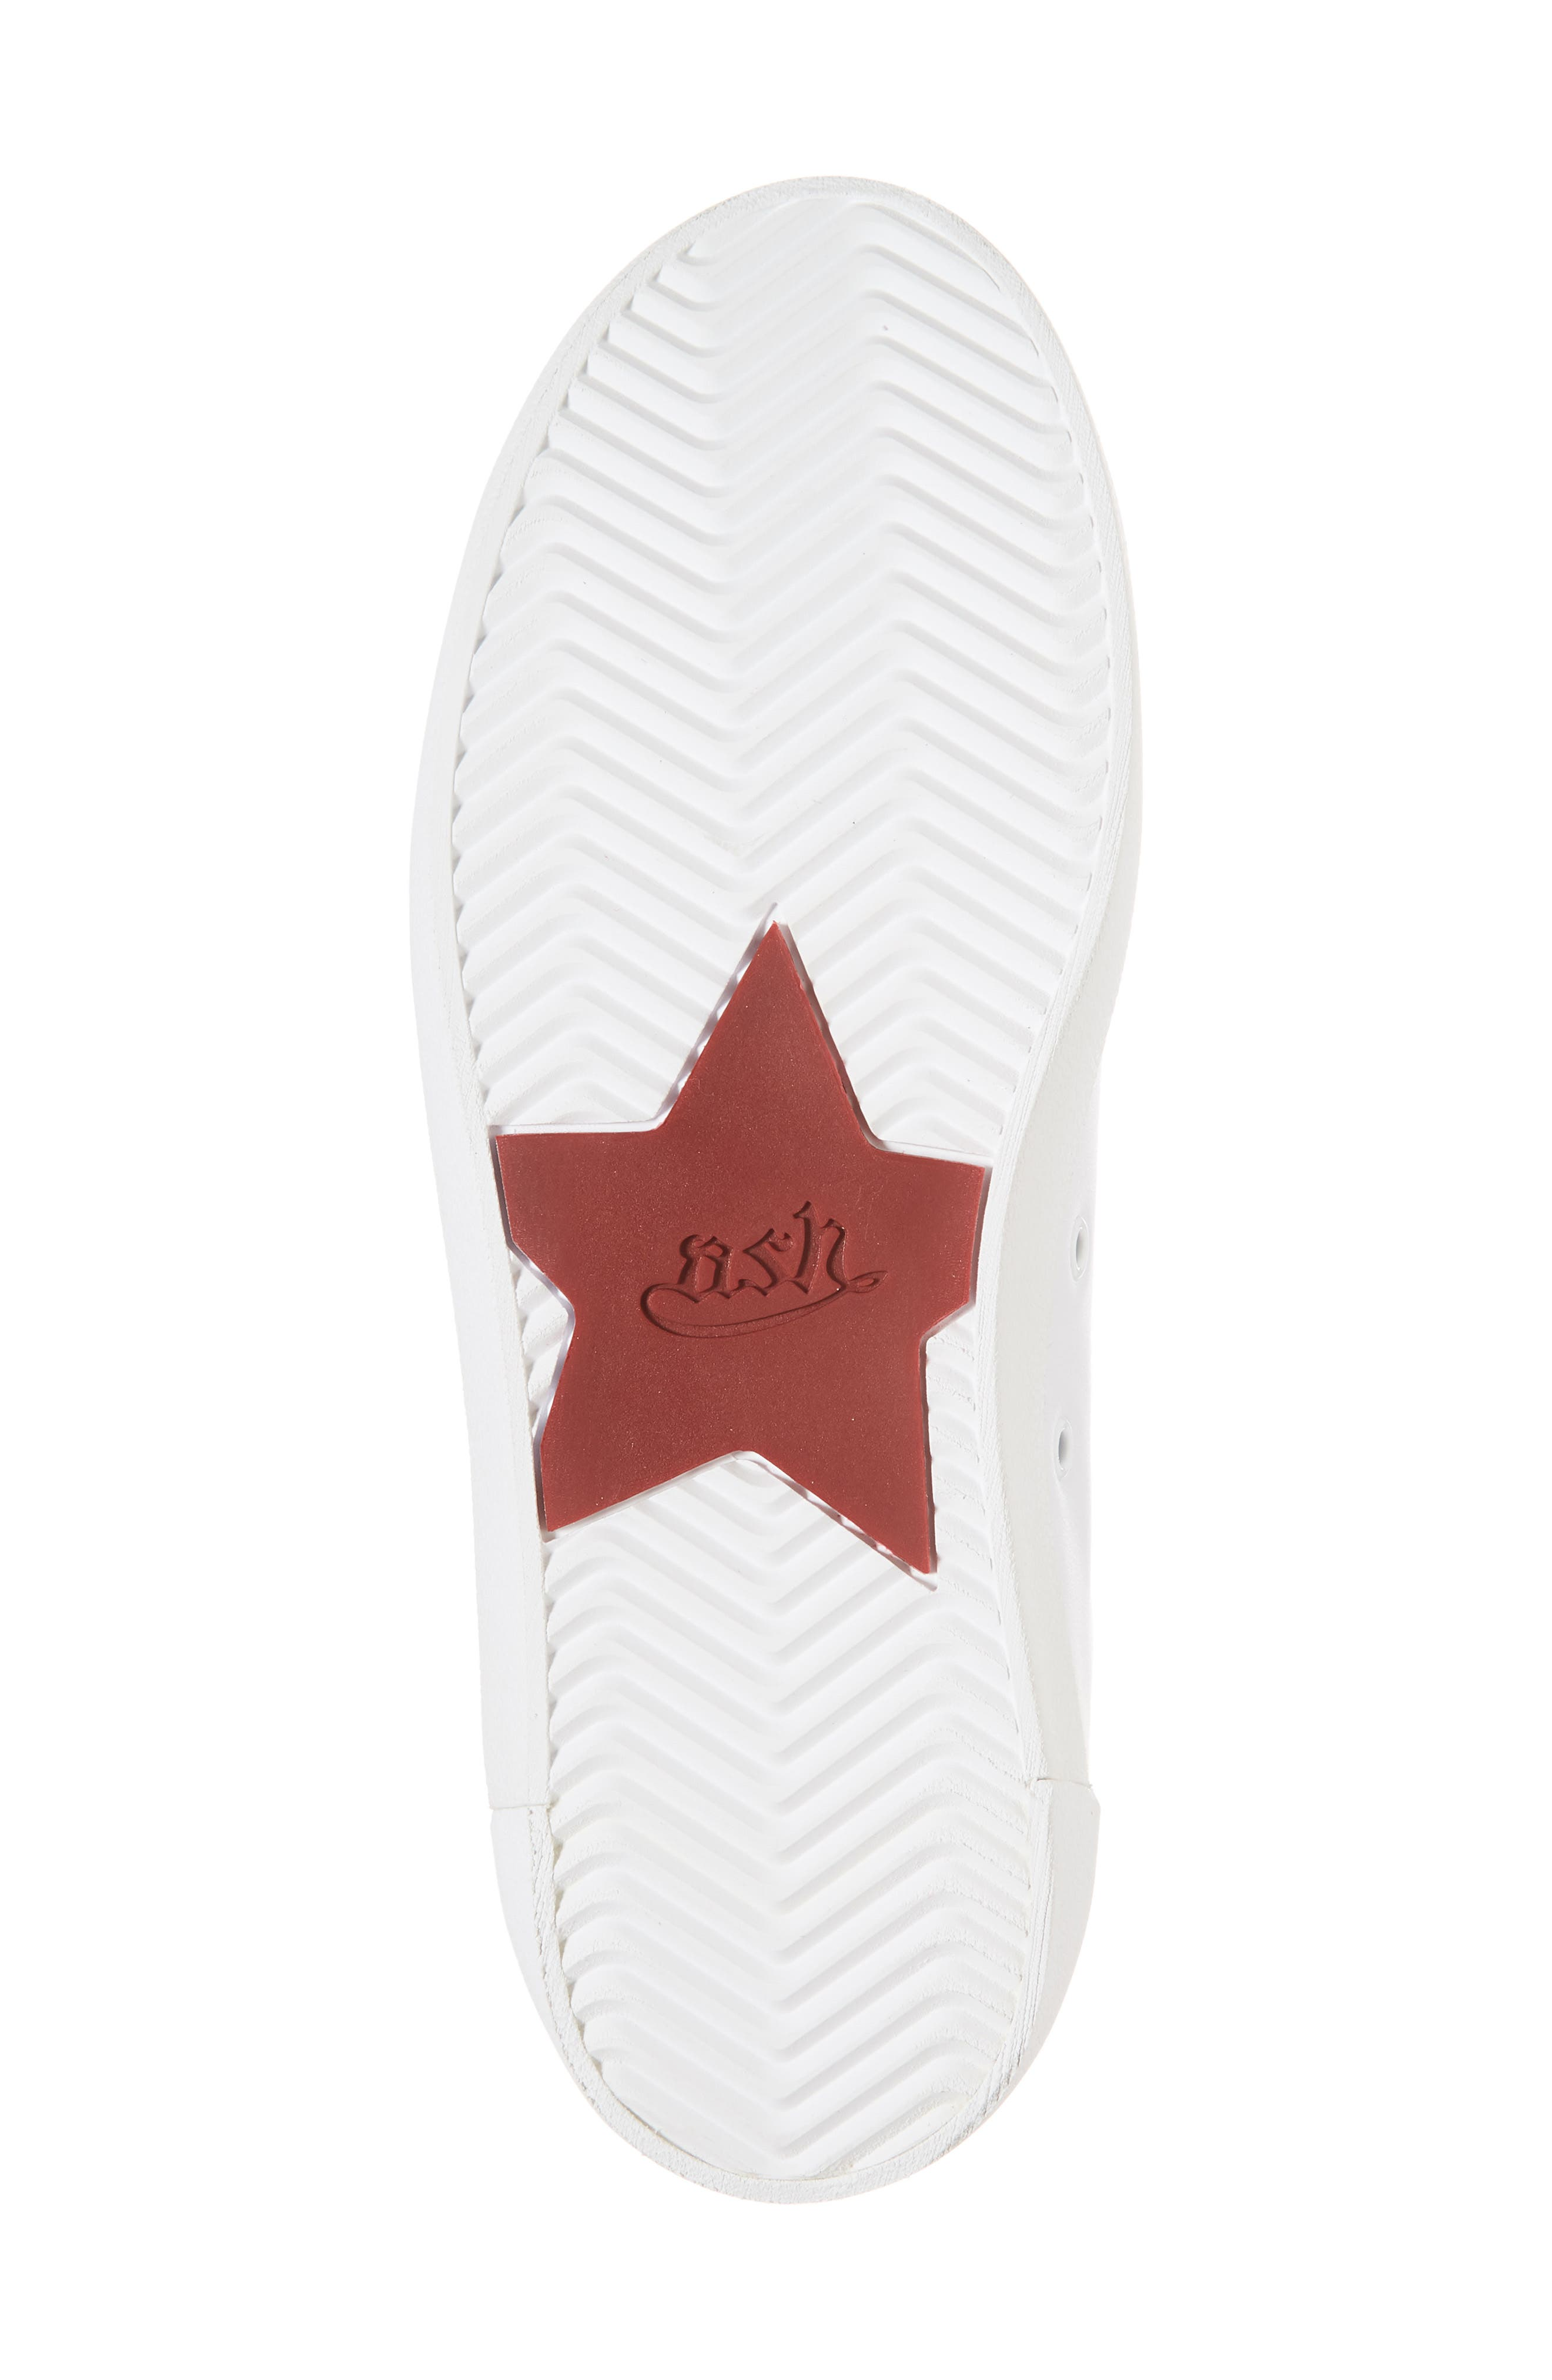 Nikita Sneaker,                             Alternate thumbnail 6, color,                             White/ Red